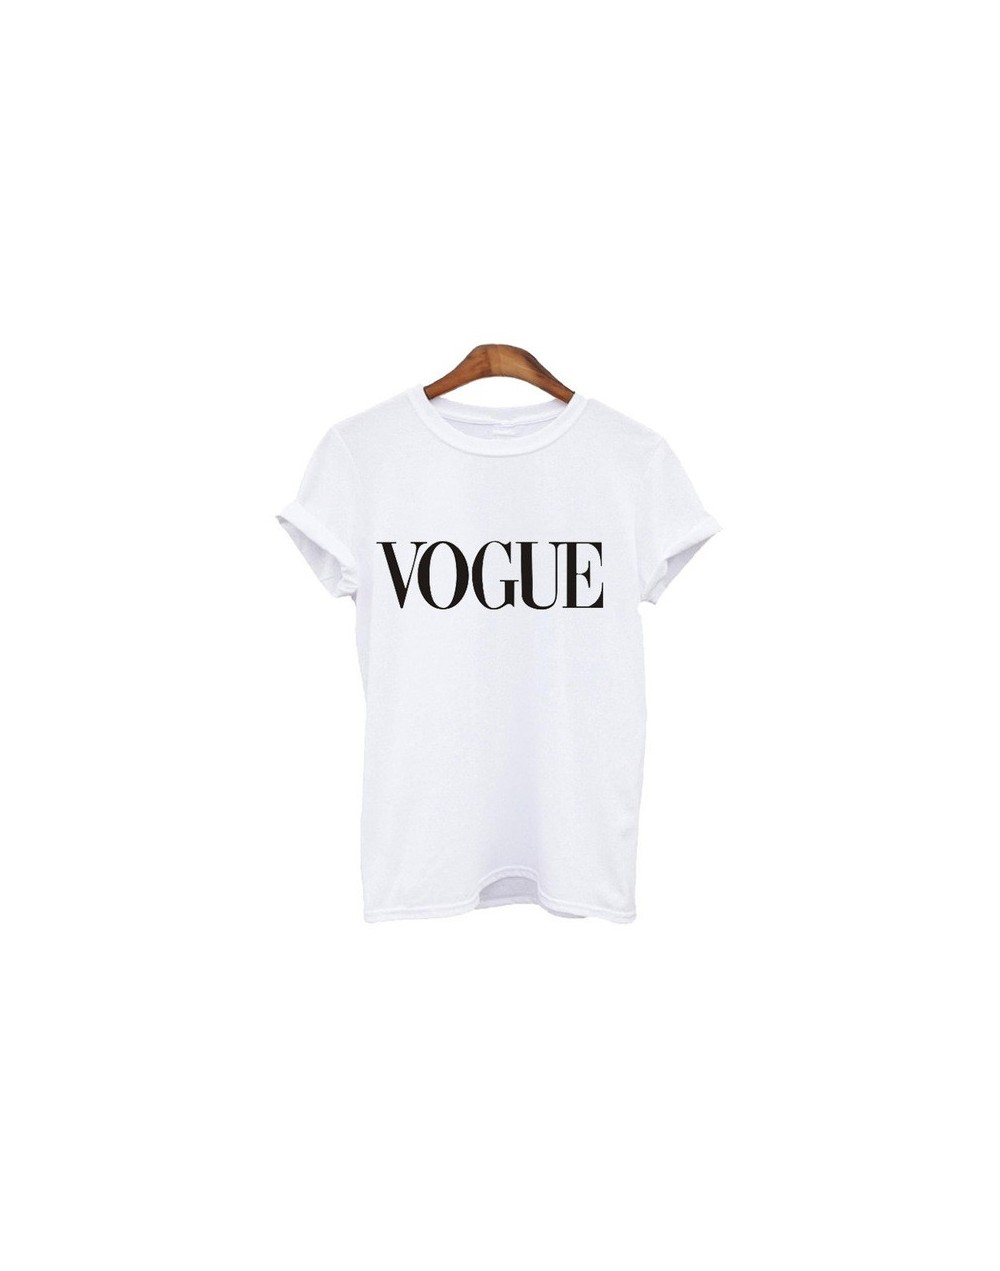 Rose Print Female T Shirt Harajuku T-Shirts Women 2019 New Summer Casual Clothing Punk Tee Hipster Tops Camisetas Mujer - T ...